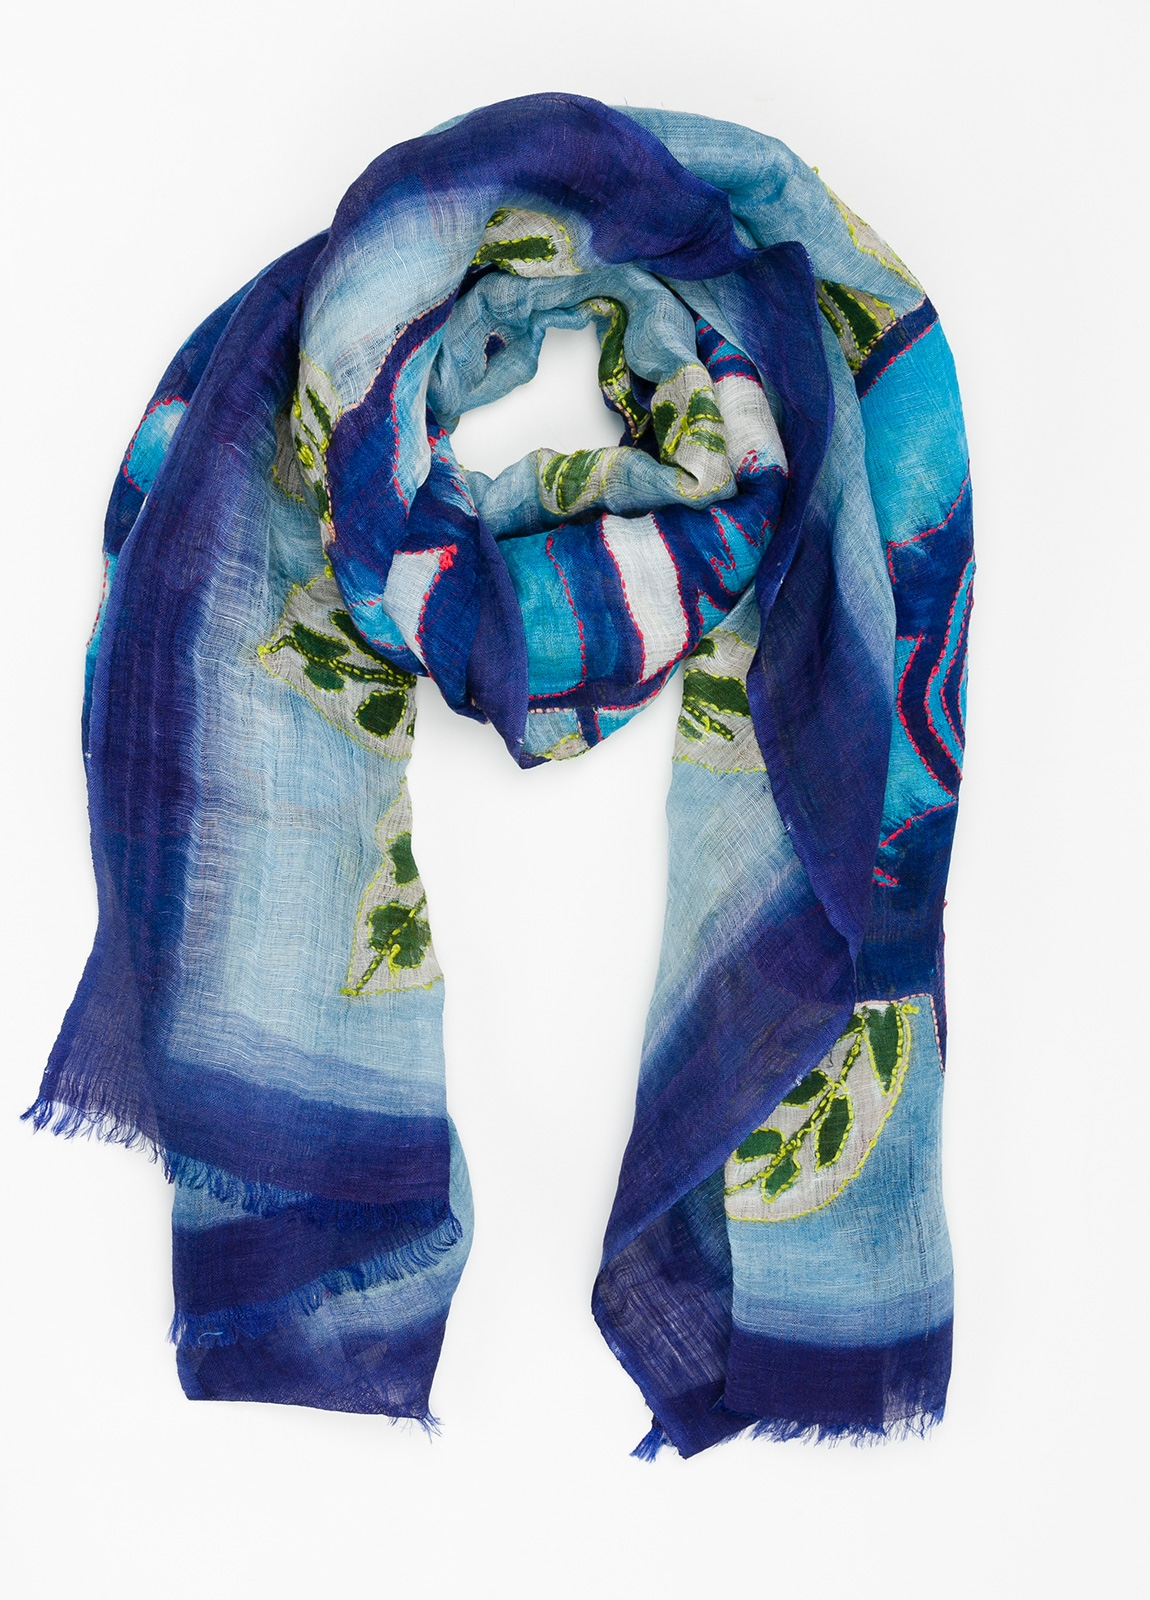 Foulard estampado floral color azul modelo ORTENSIA 70% Lino 30% Seda.